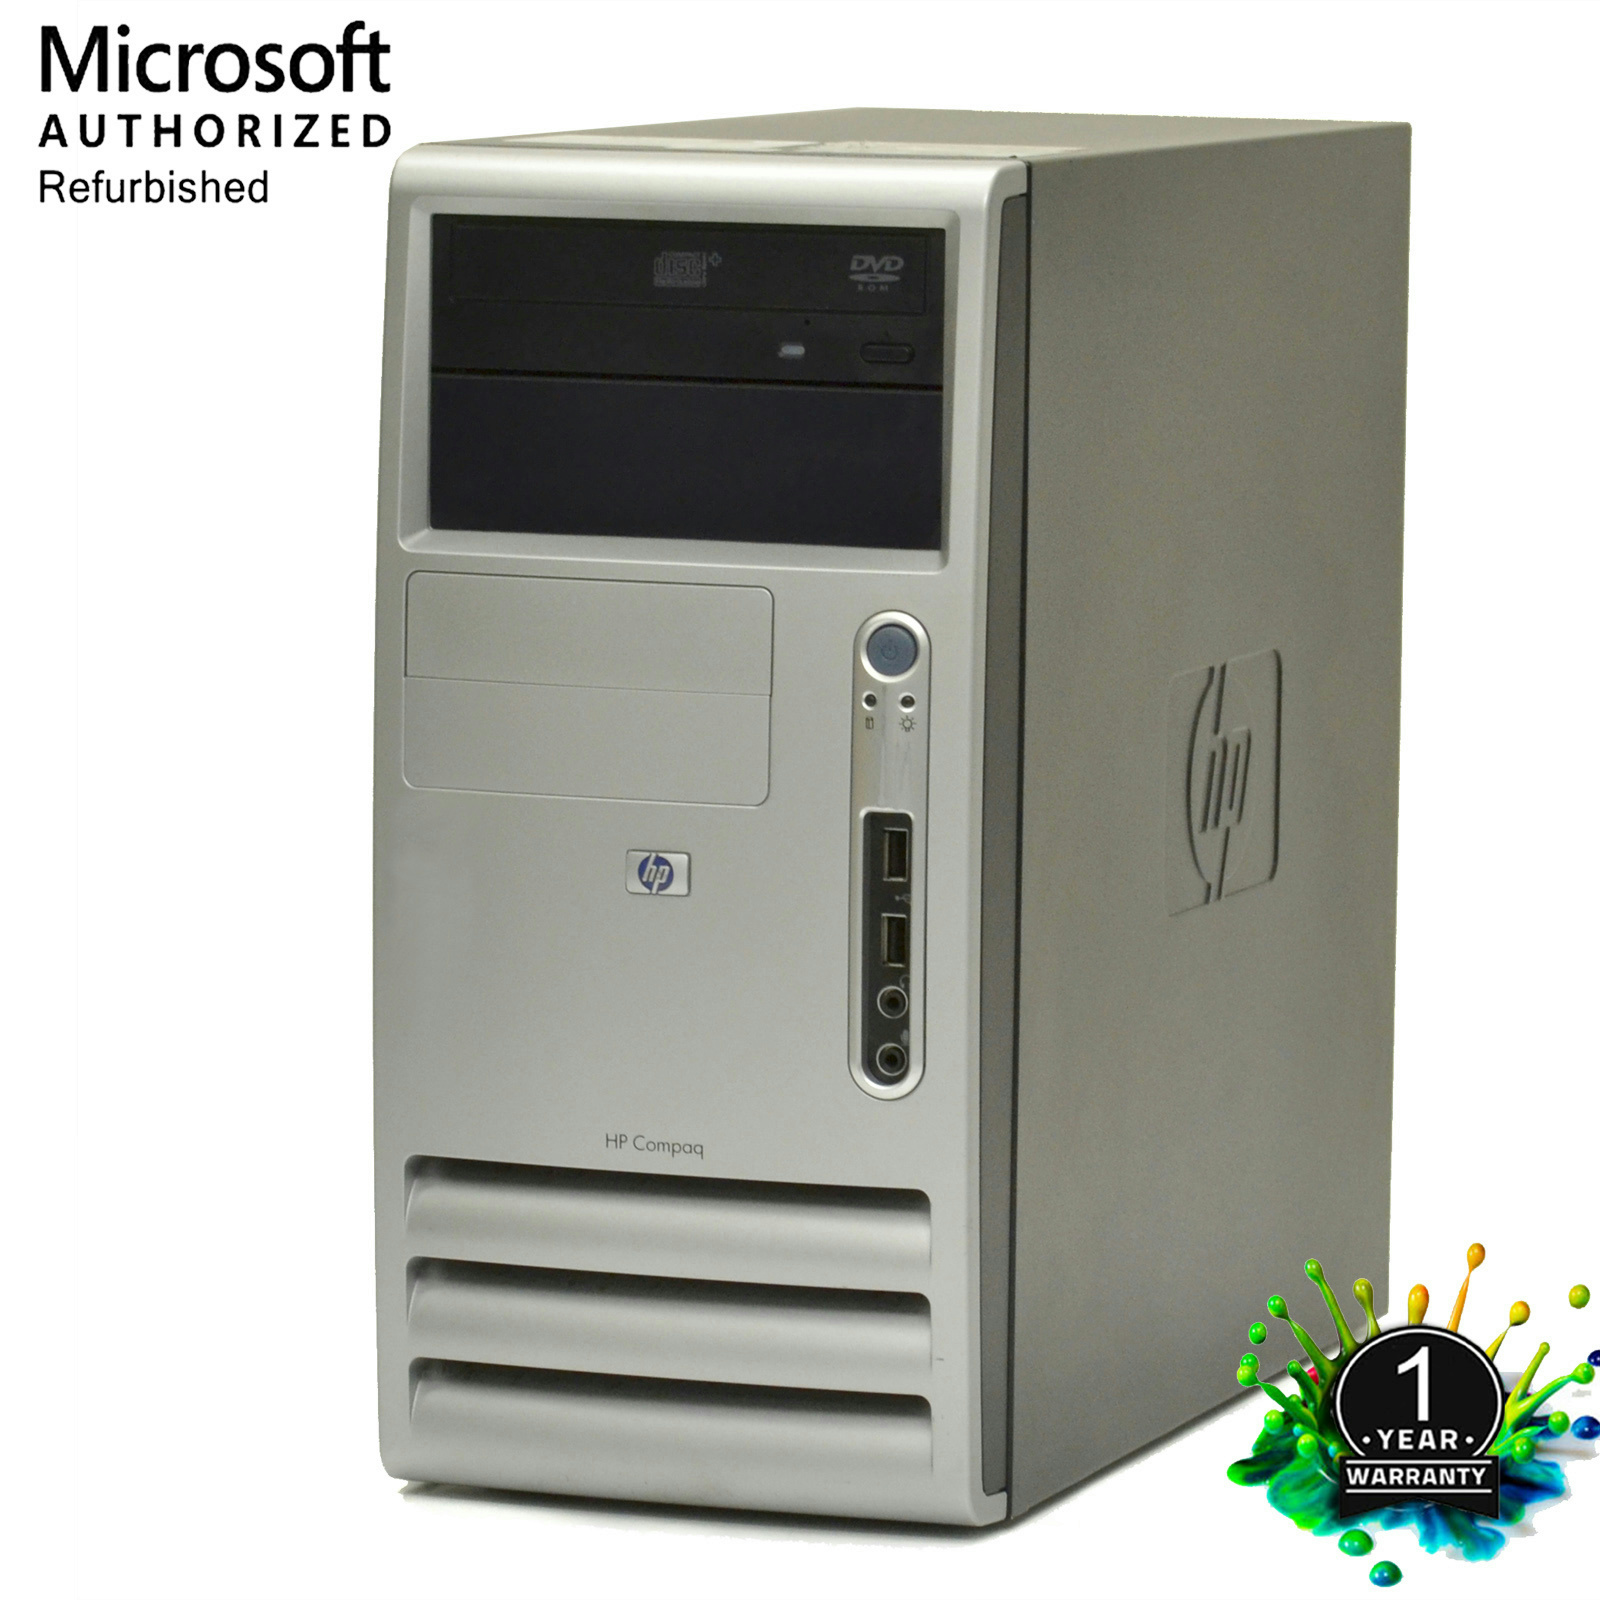 HP Compaq Windows 7 Home Premium 64 Bit Desktop Computer PC